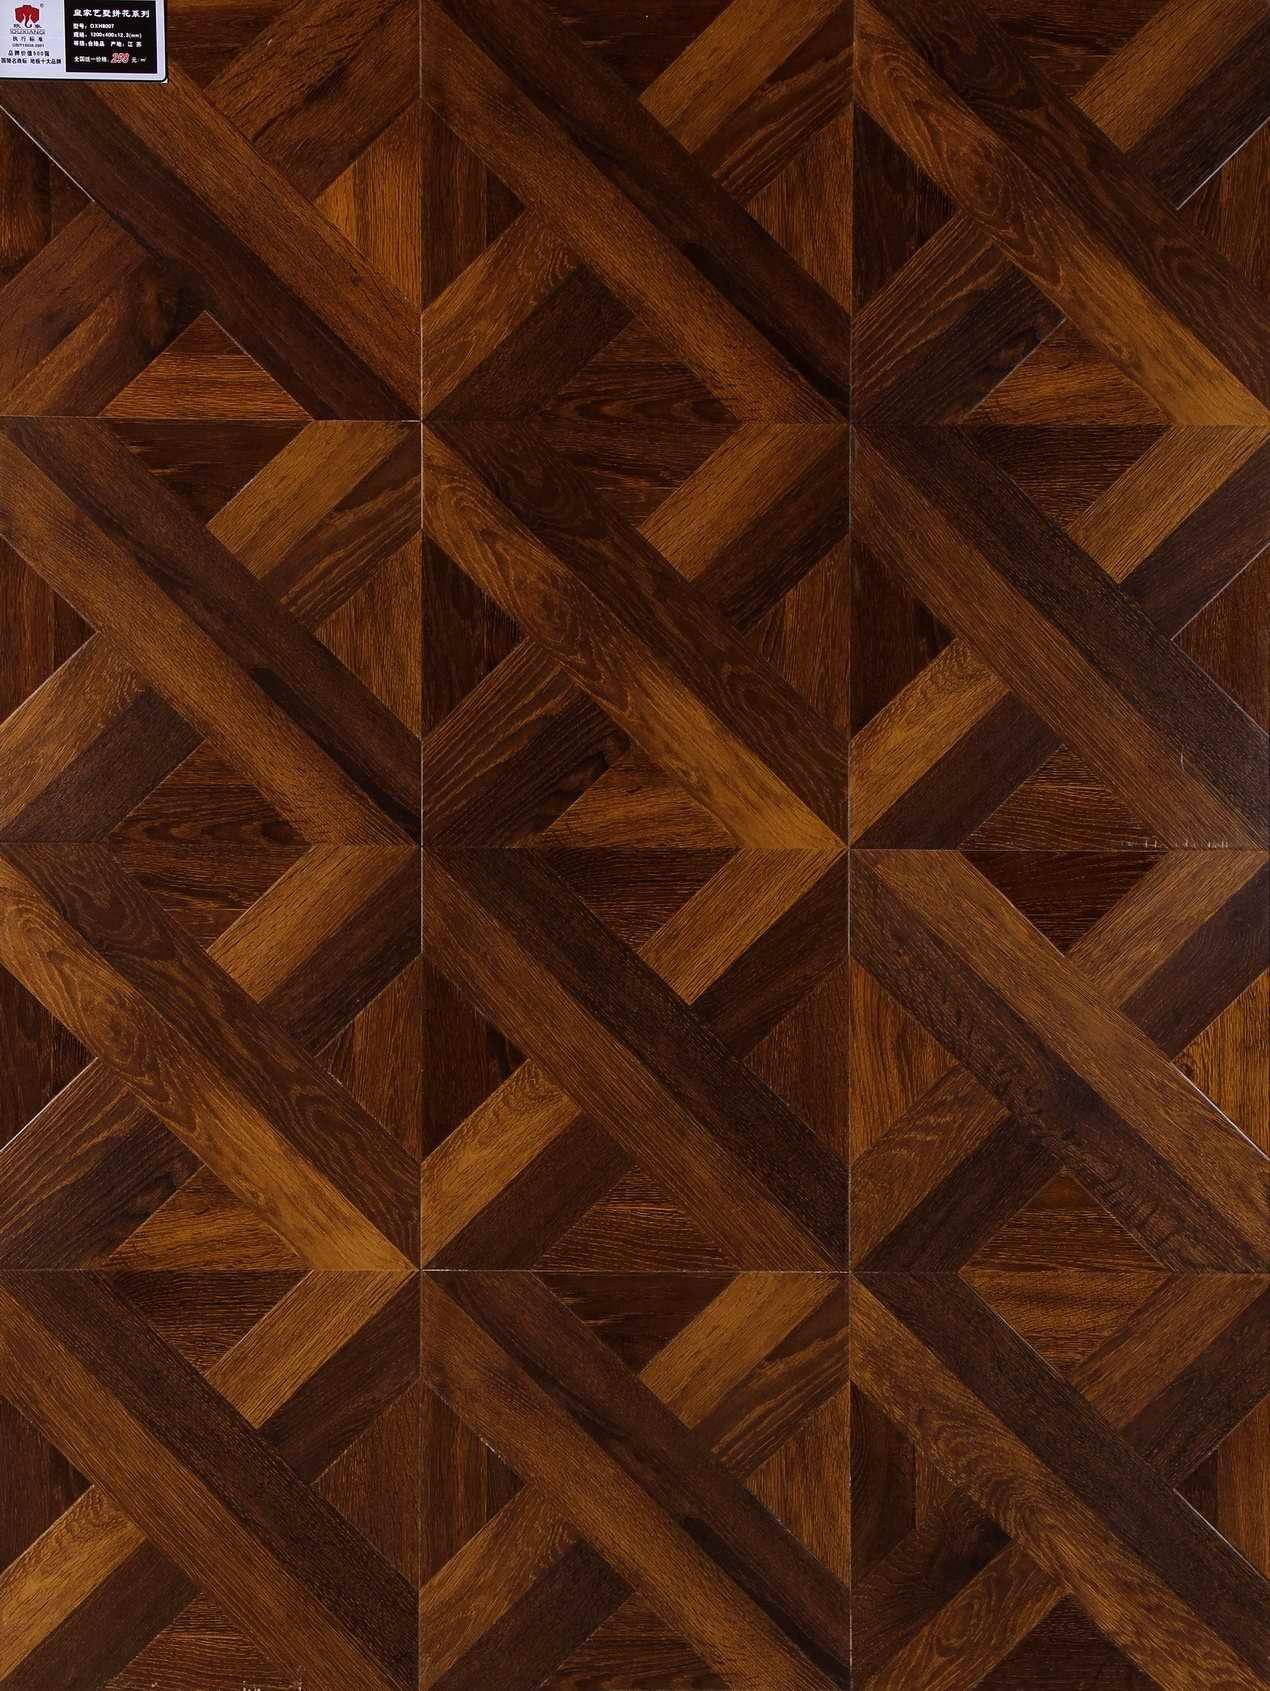 China Parquet Flooring (OXH8007) - large image for Parquet